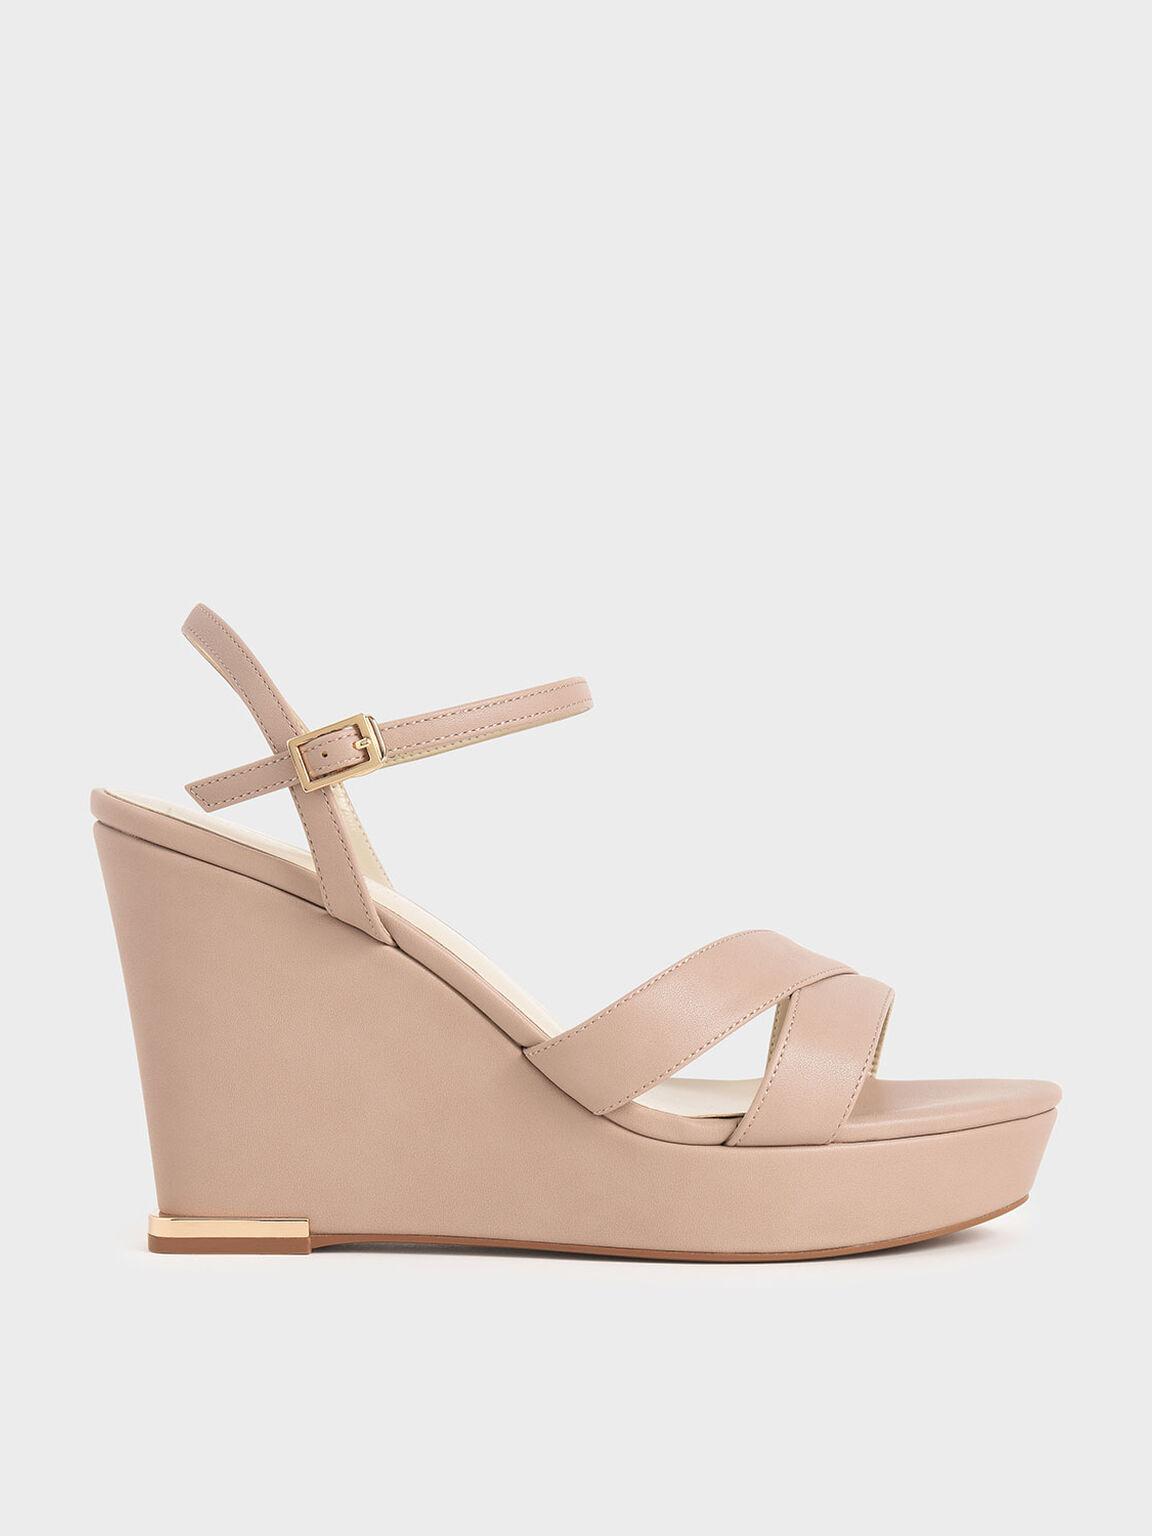 Sepatu Asymmetric Strap Platform Wedges, Nude, hi-res